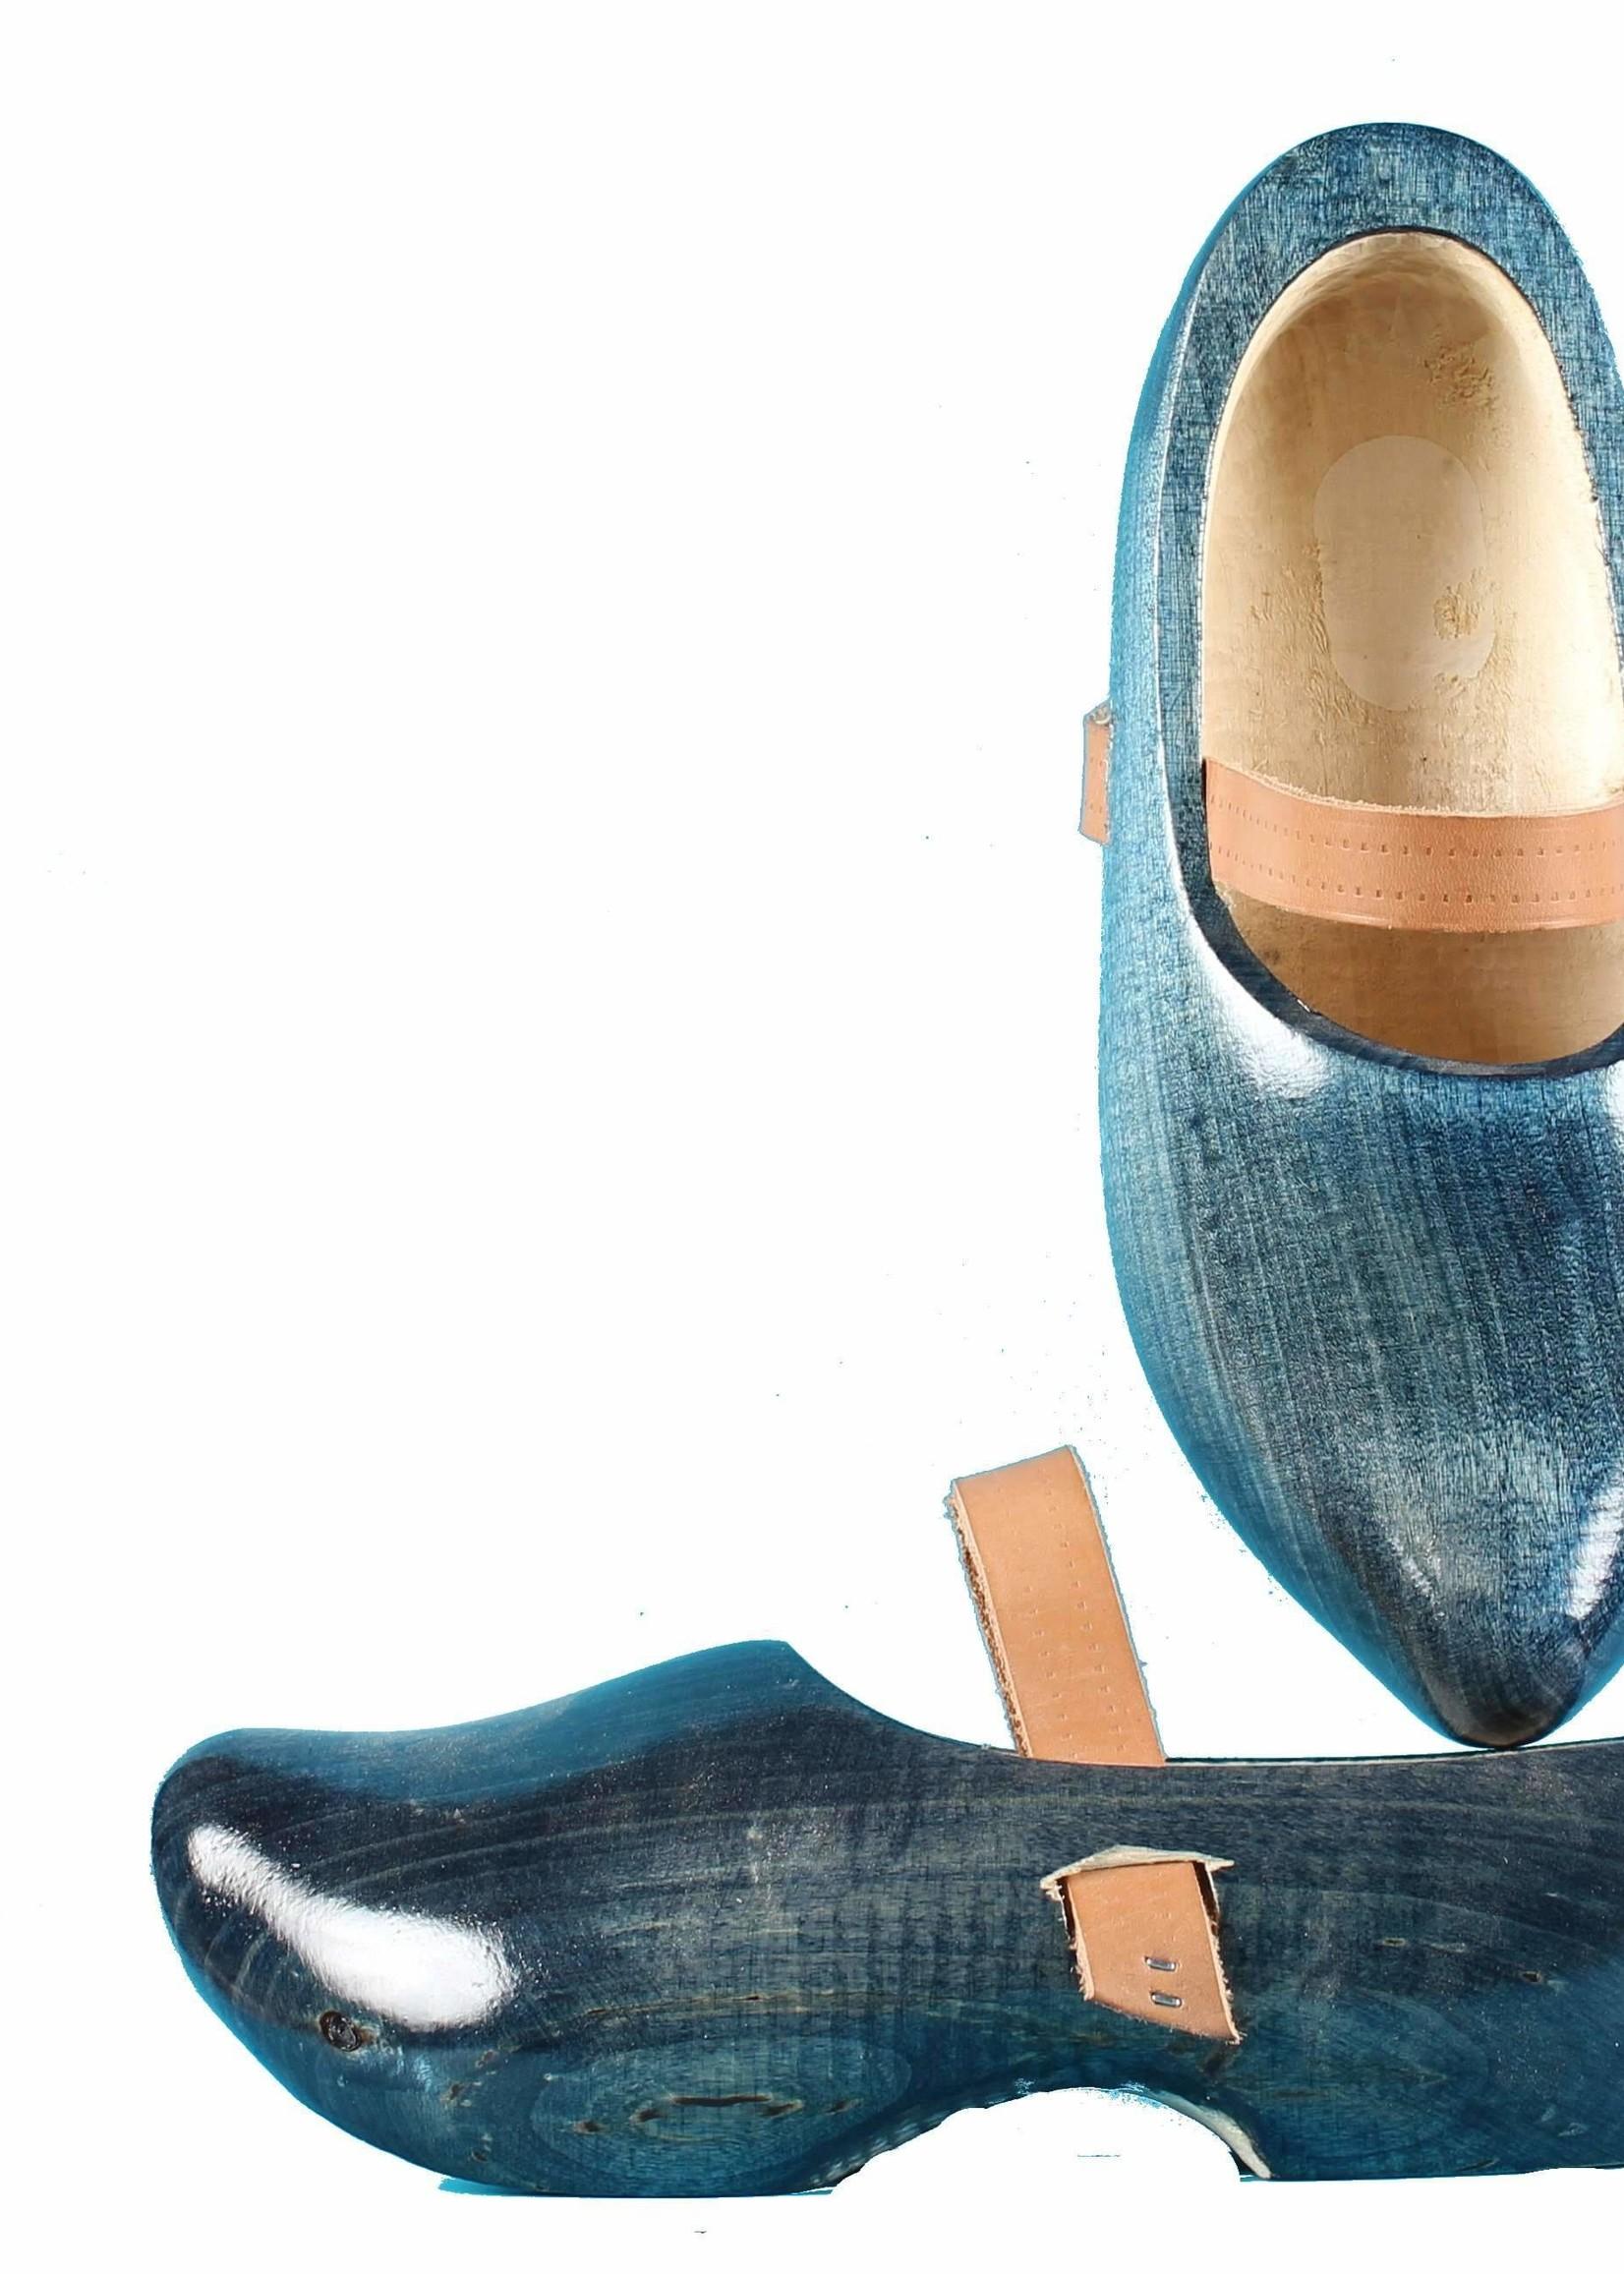 Wooden Shoe Factory Marken Wooden Shoes Tripklomp Denim, Leather Strap Clog